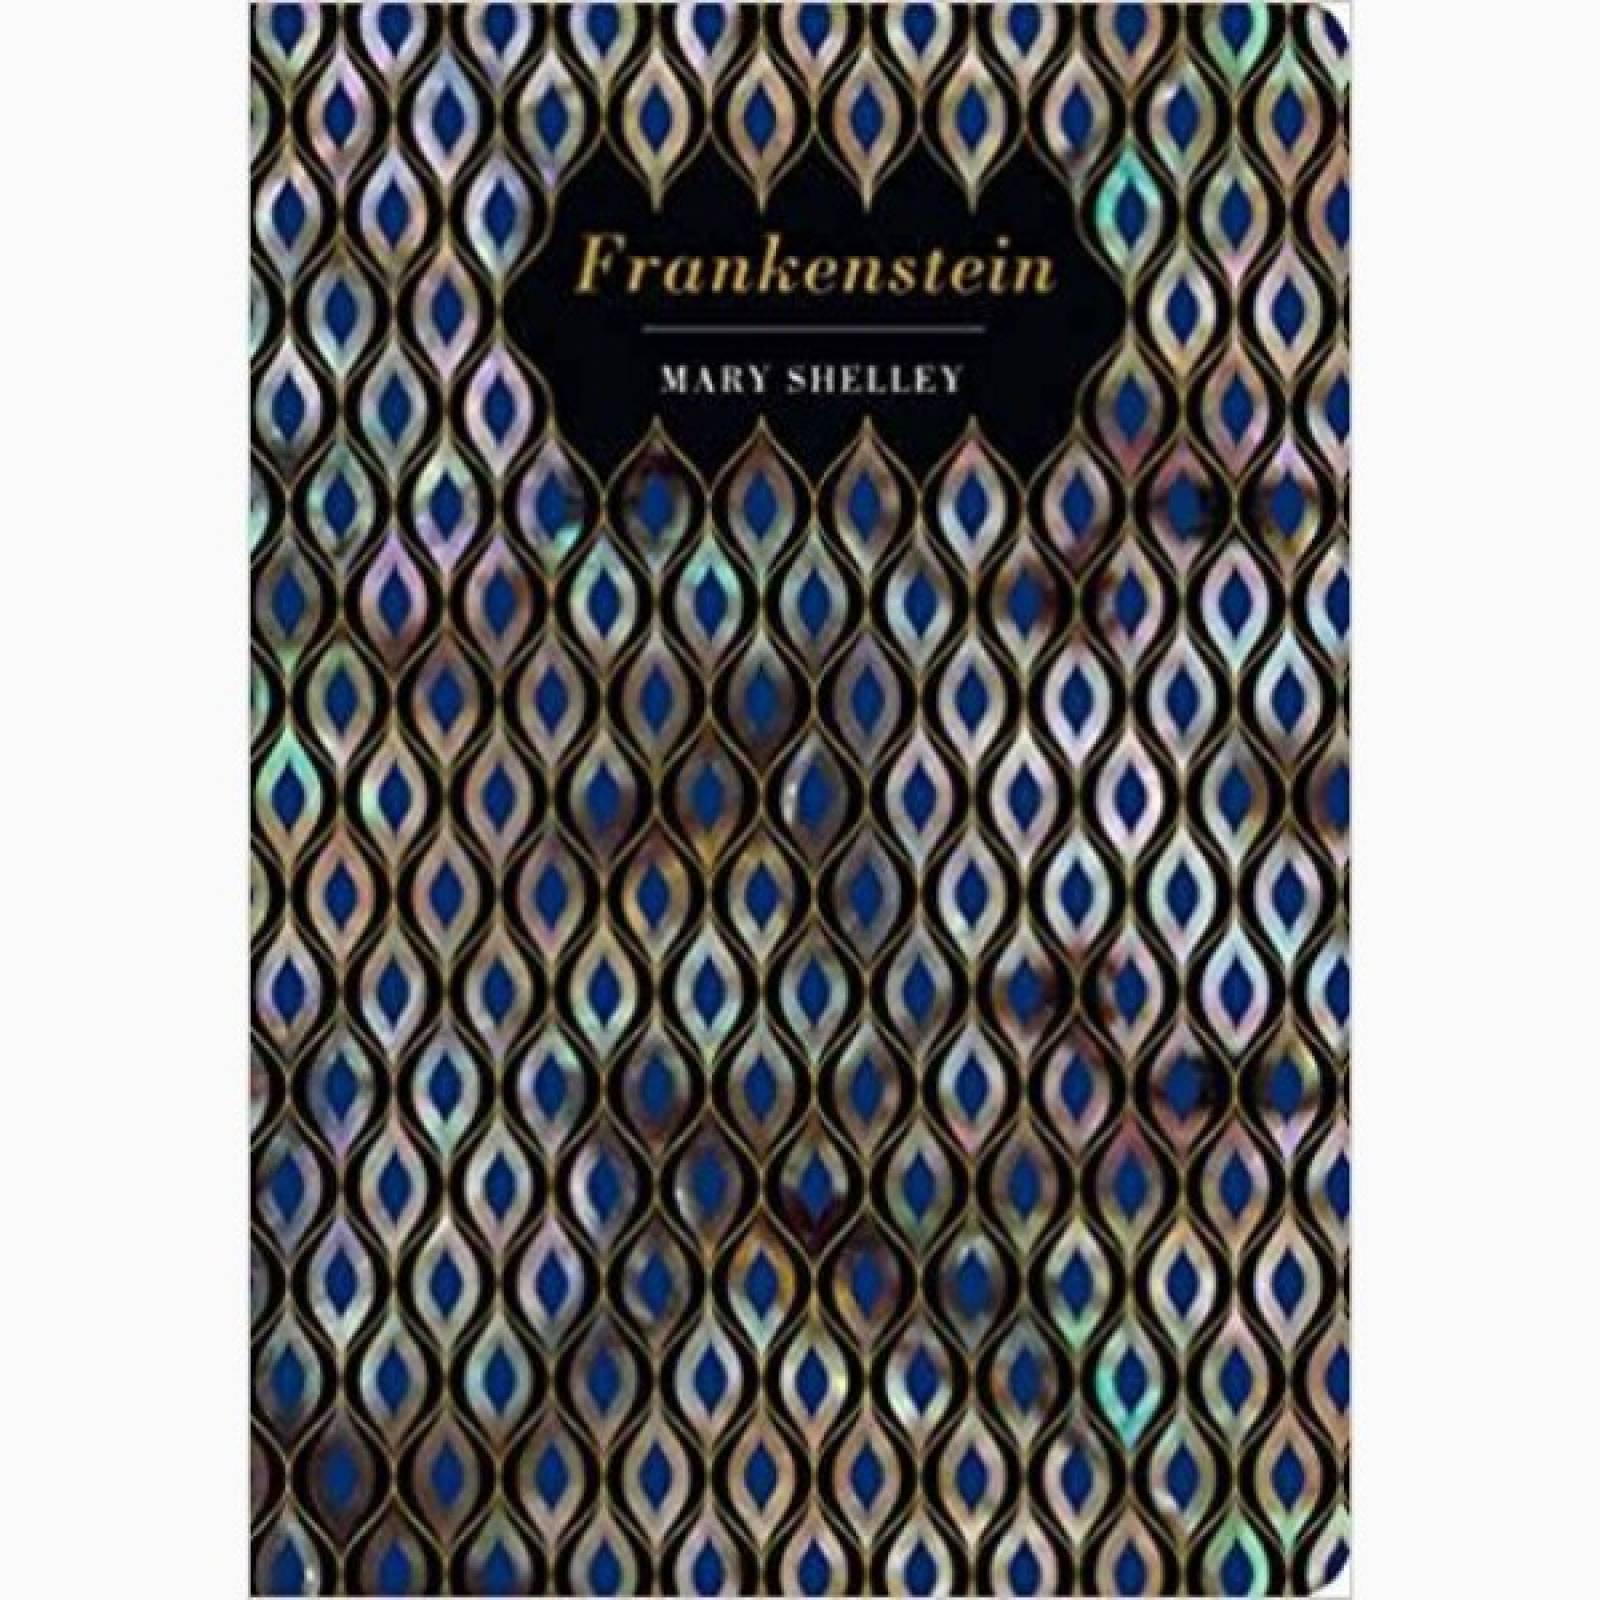 Frankenstein - Chiltern Classics Hardback Book